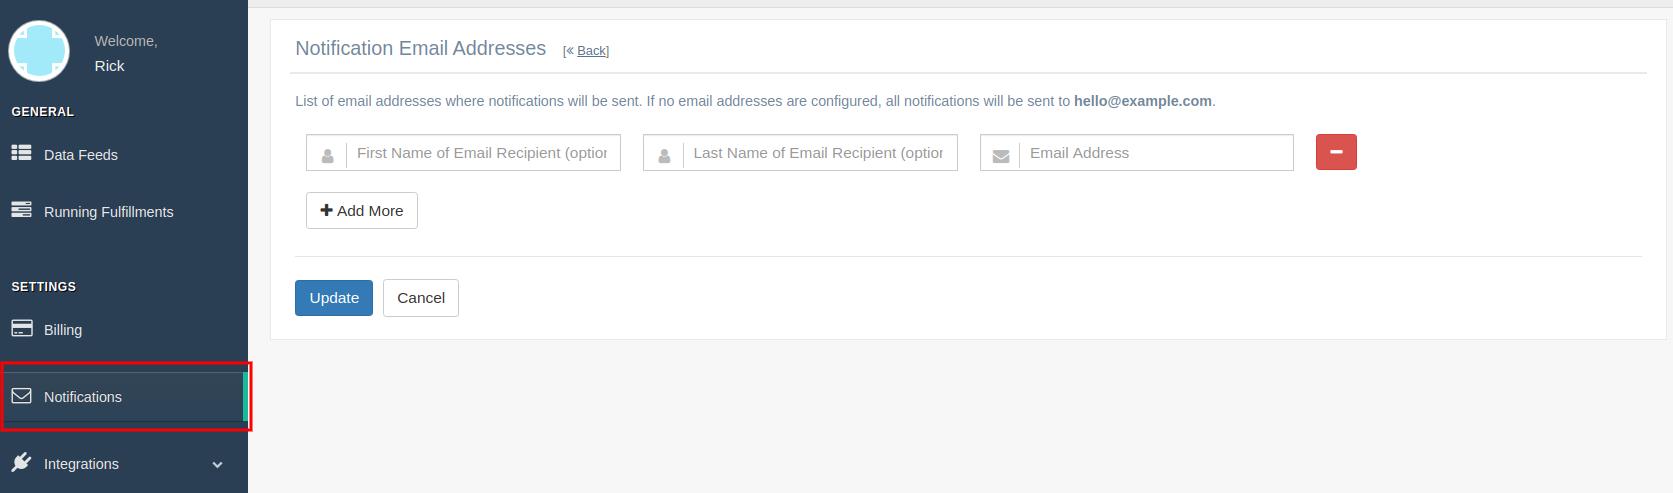 Configure Customer Email Addresses